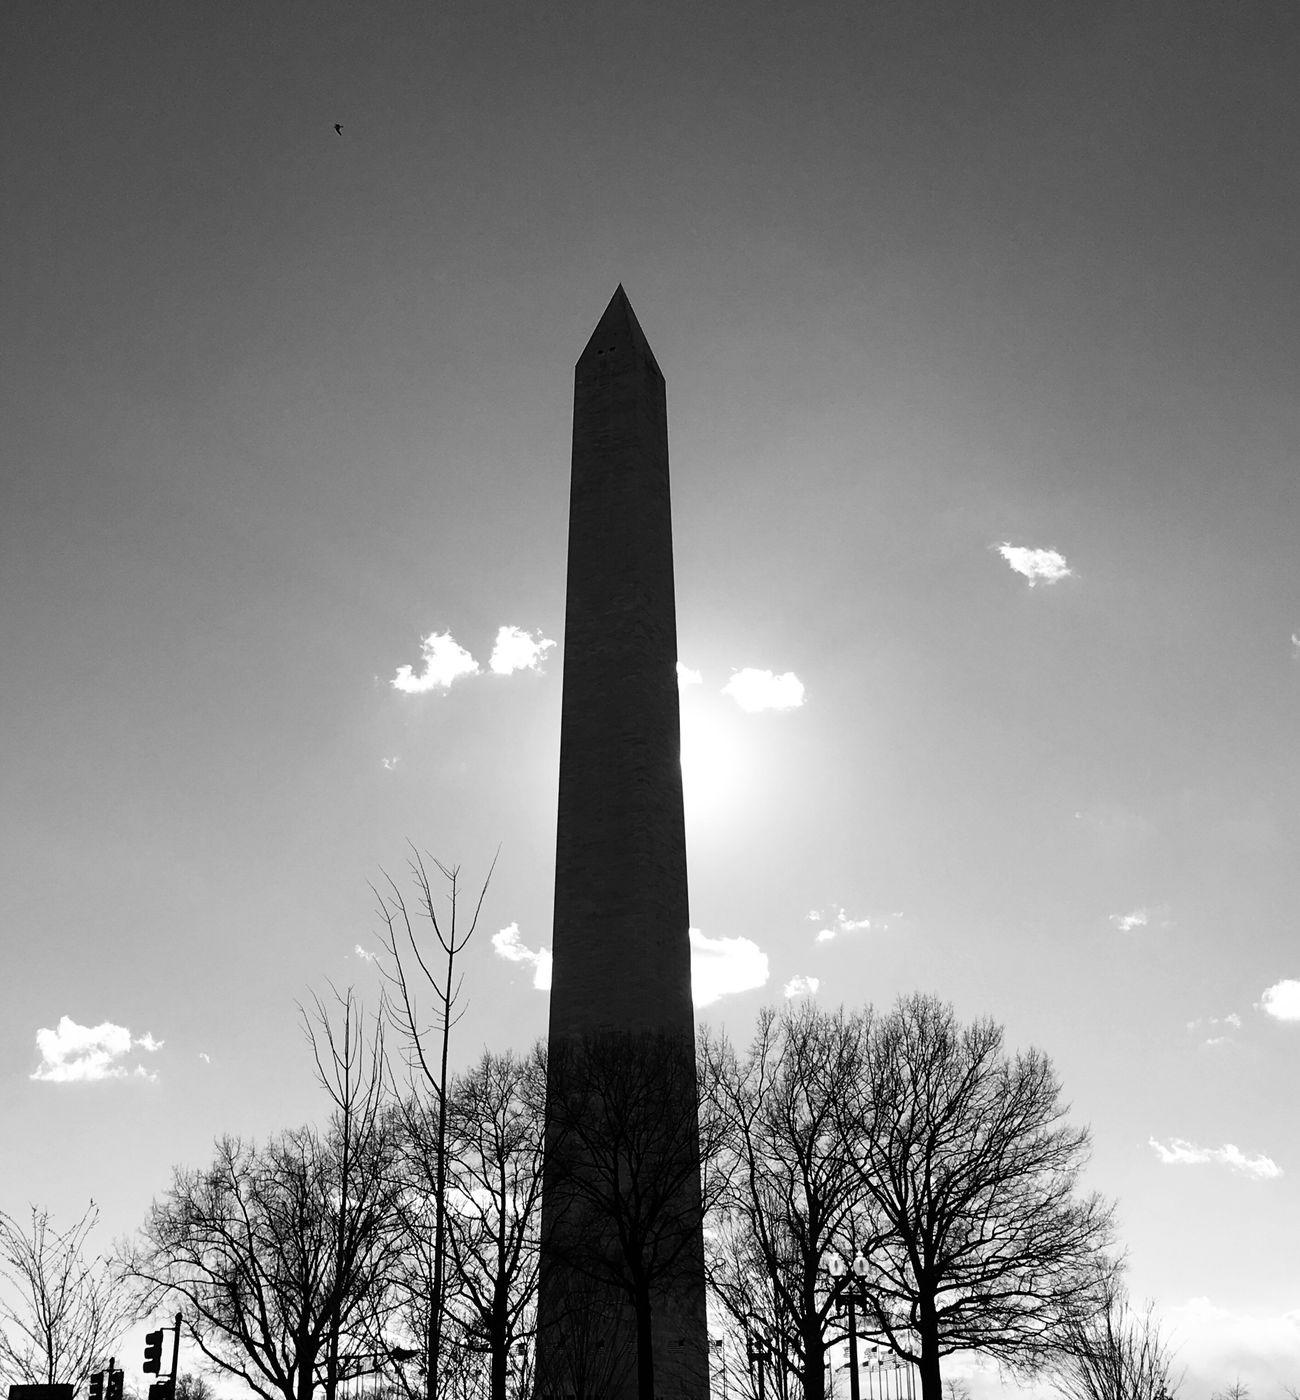 Monument Architecture Sky Blackandwhite EyeEm Best Shots - Black + White Streetphoto_bw Streetphotography The City Light Trees